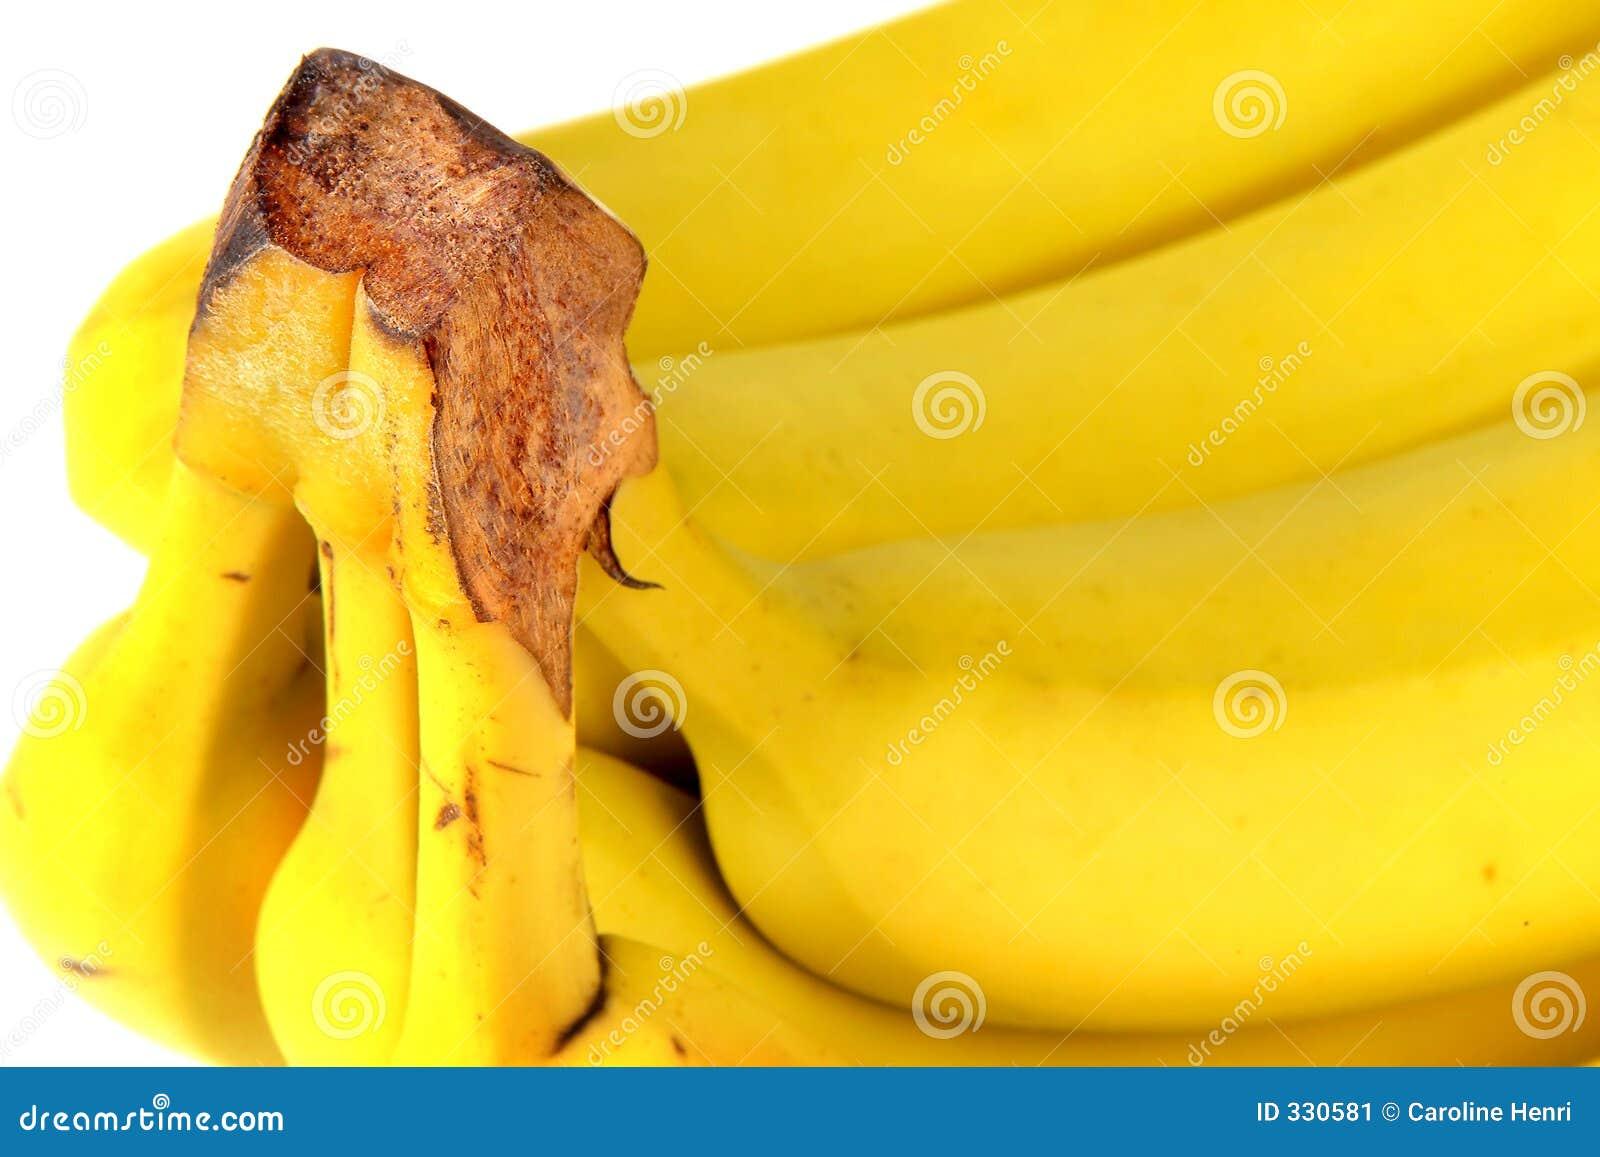 Bananes jaunes